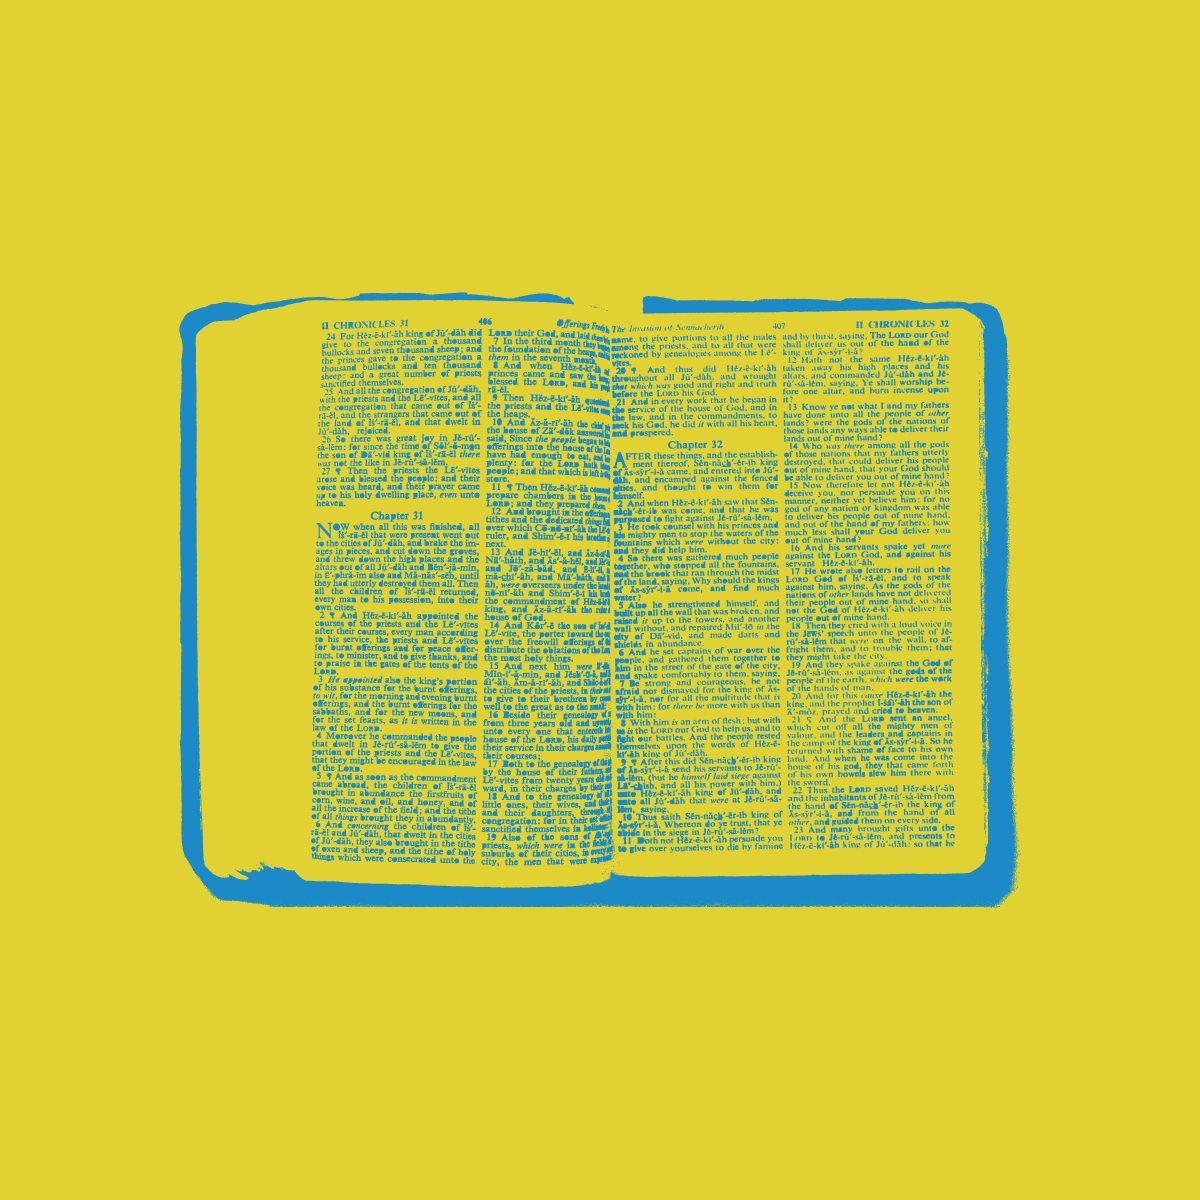 Making Sense of Scripture's 'Inconsistency'